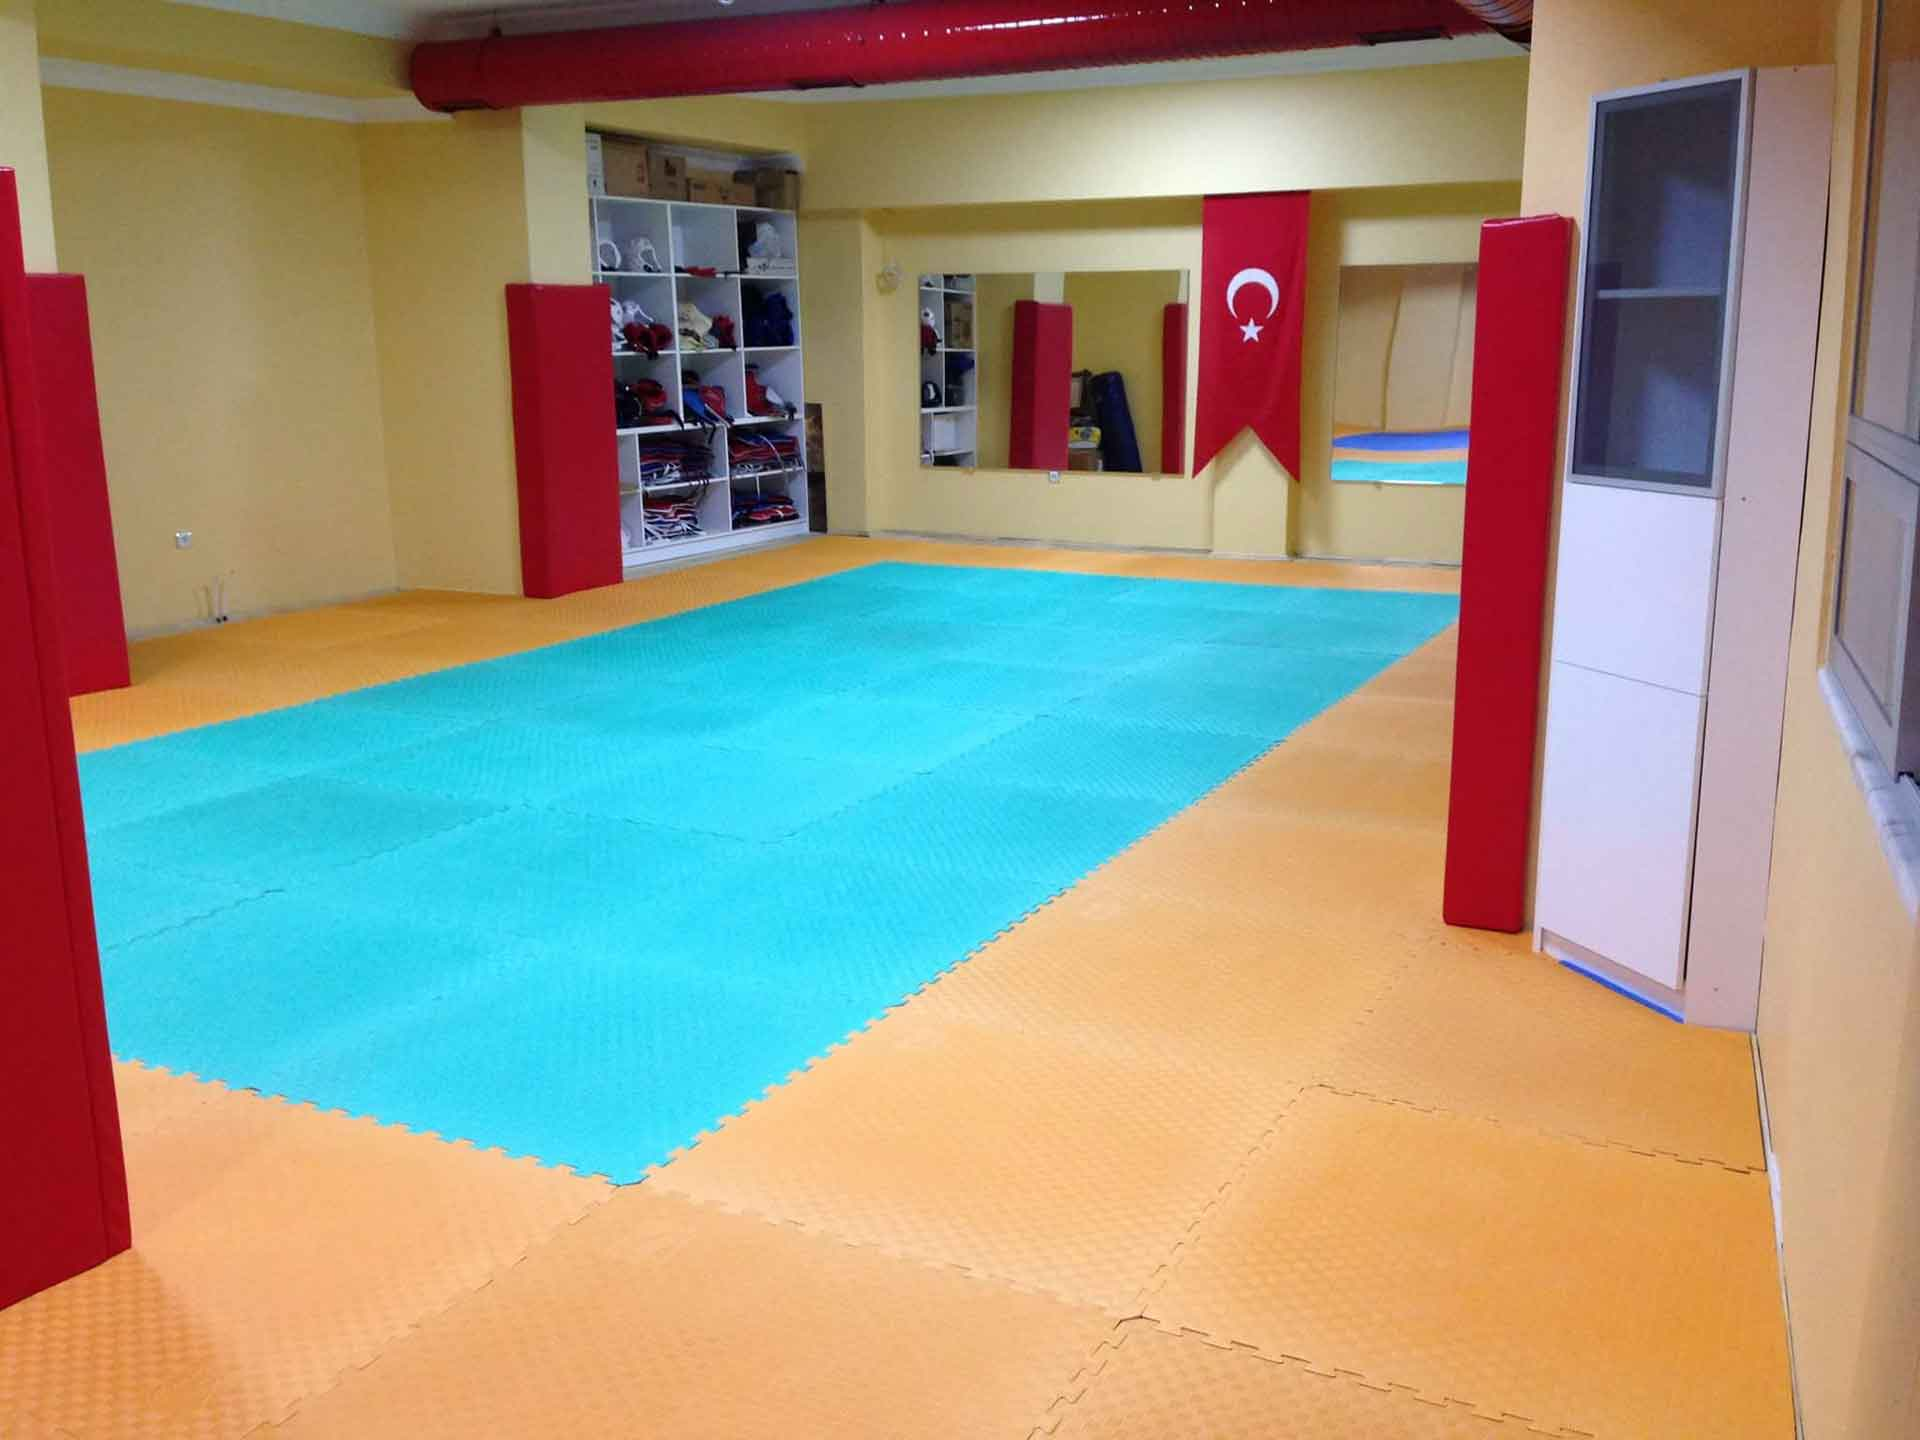 Cihan Spor Kulübü - Taekwondo Salonu